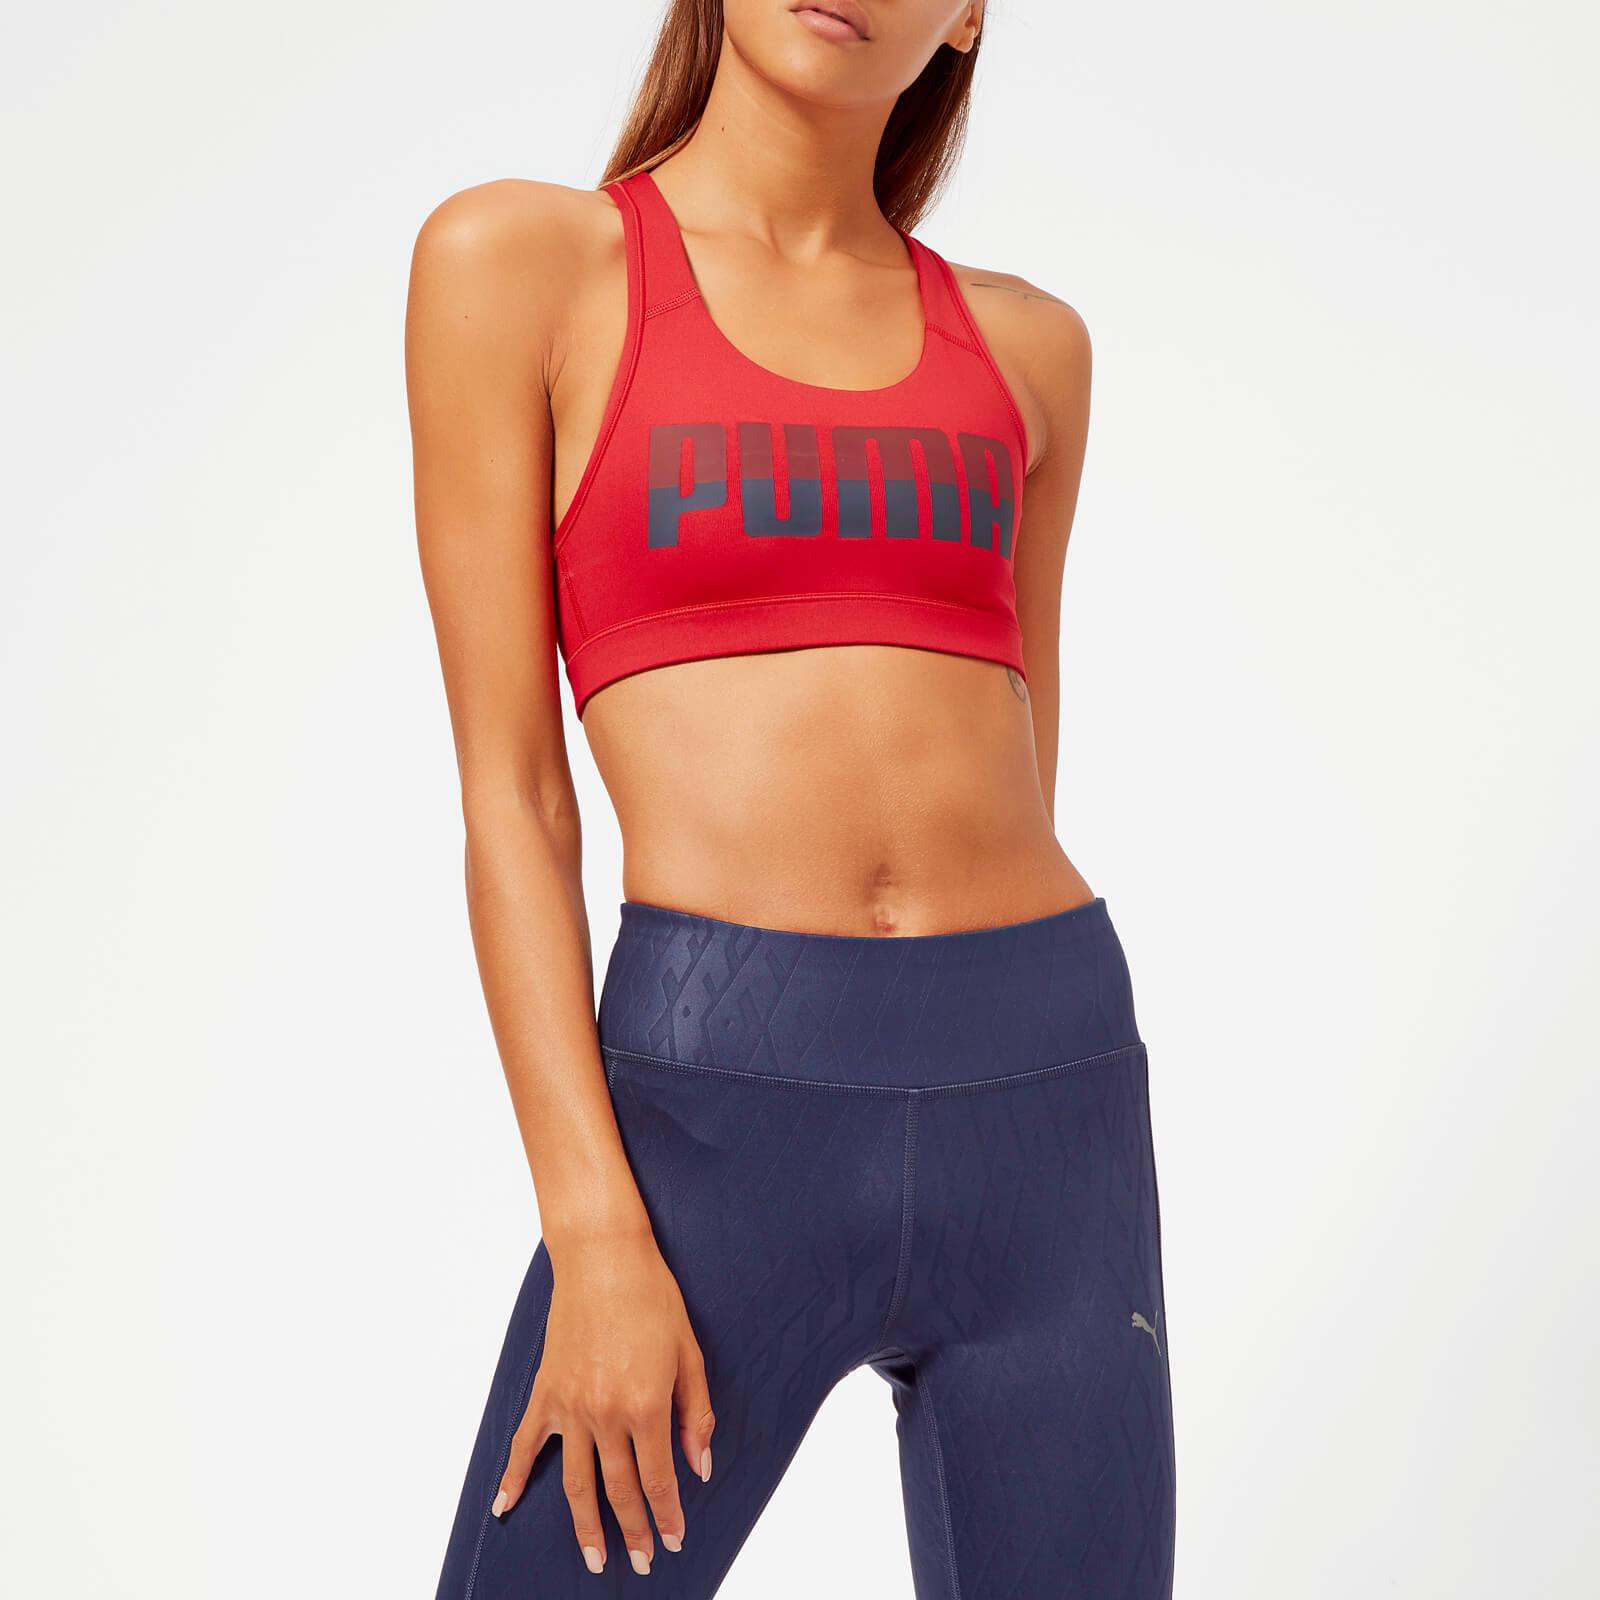 Puma Women's 4 Keeps Sports Bra - Ribbon Red - XXS/UK 6 - Red